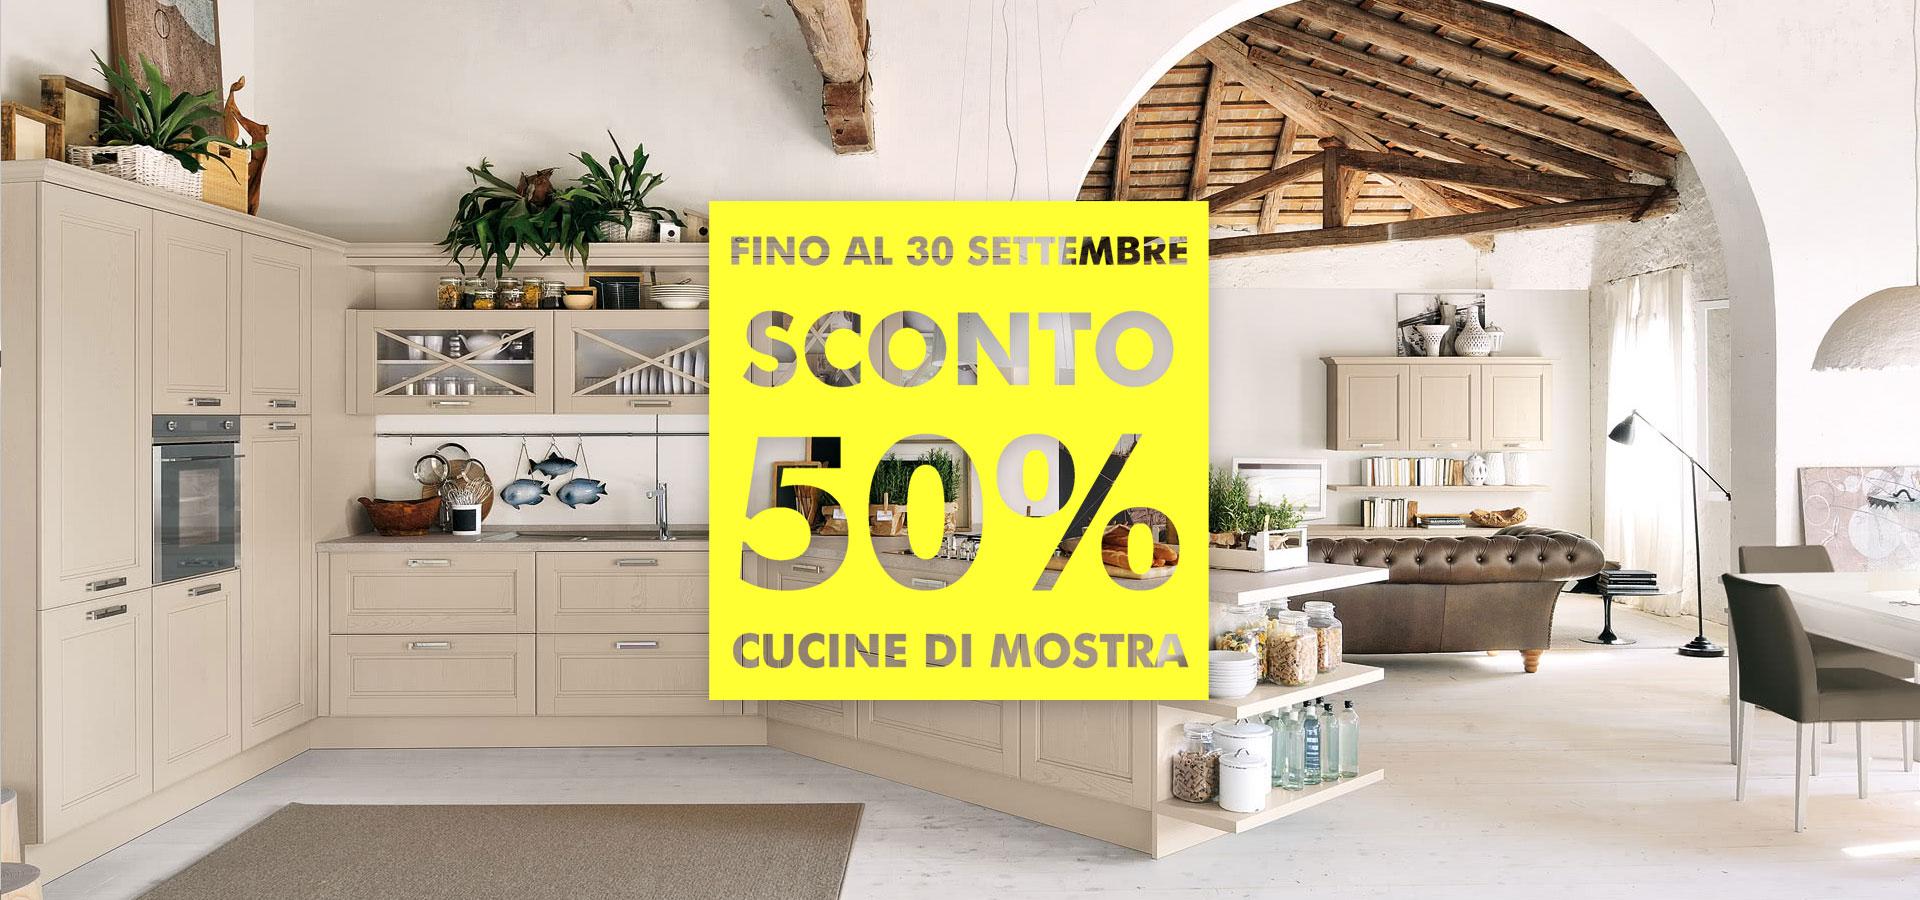 50 cucine expo off